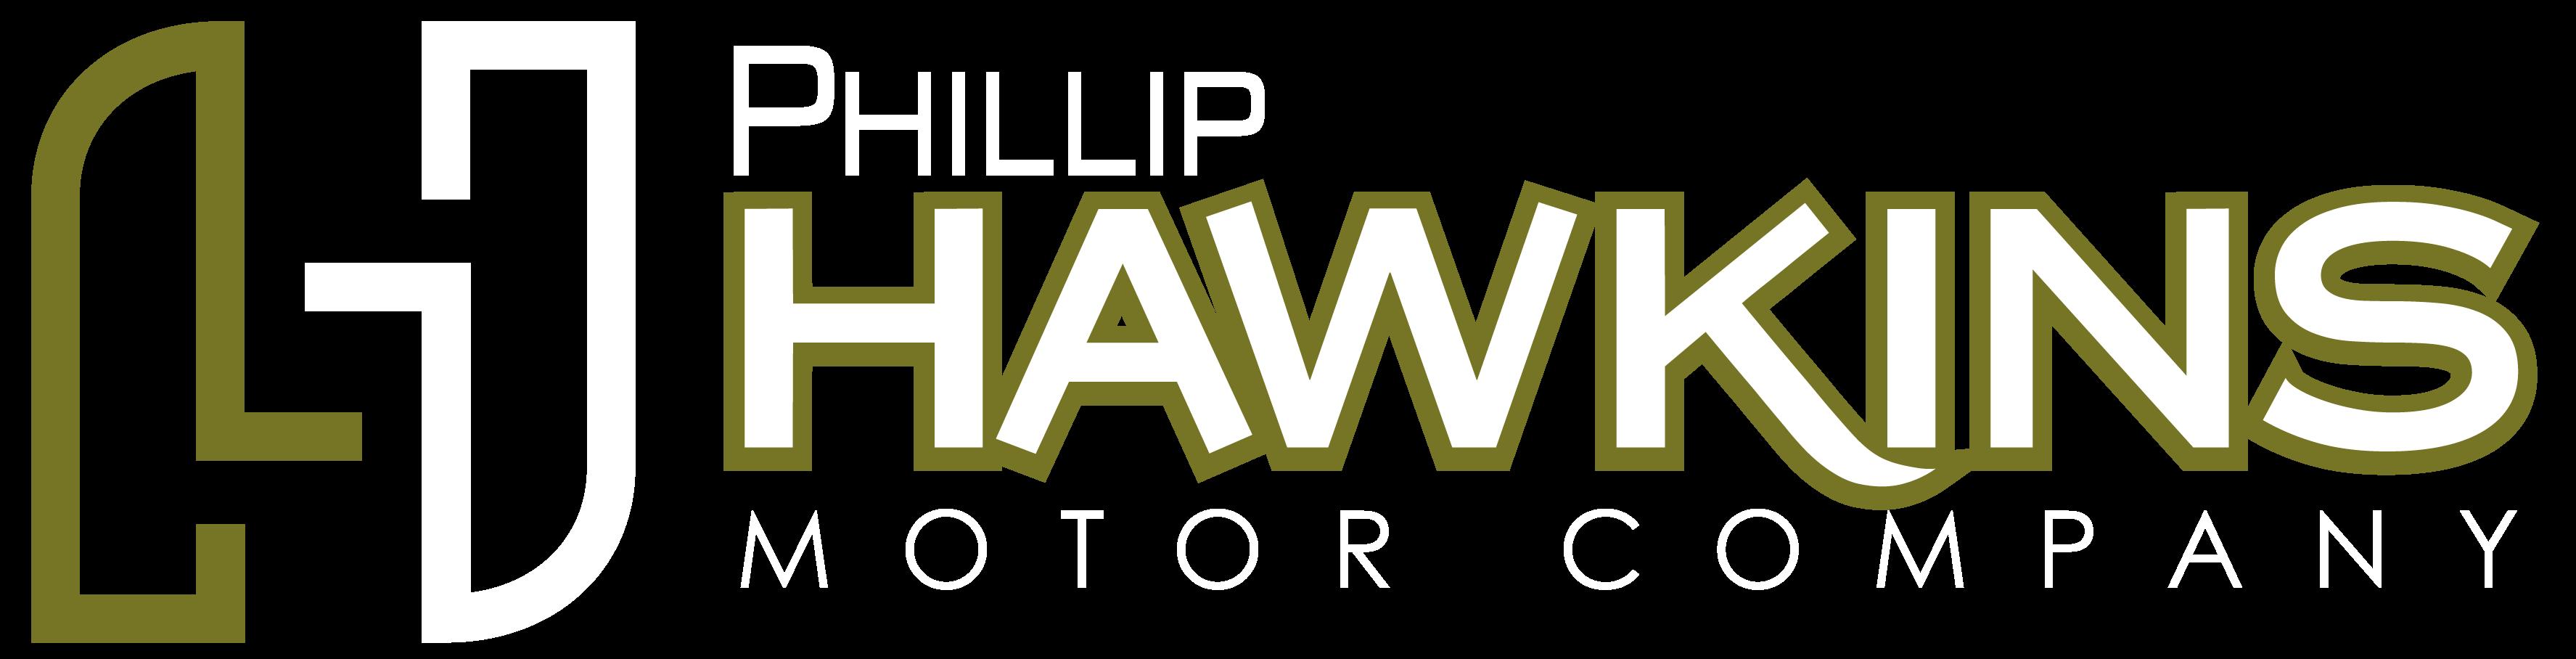 Phillip Hawkins Motor Company